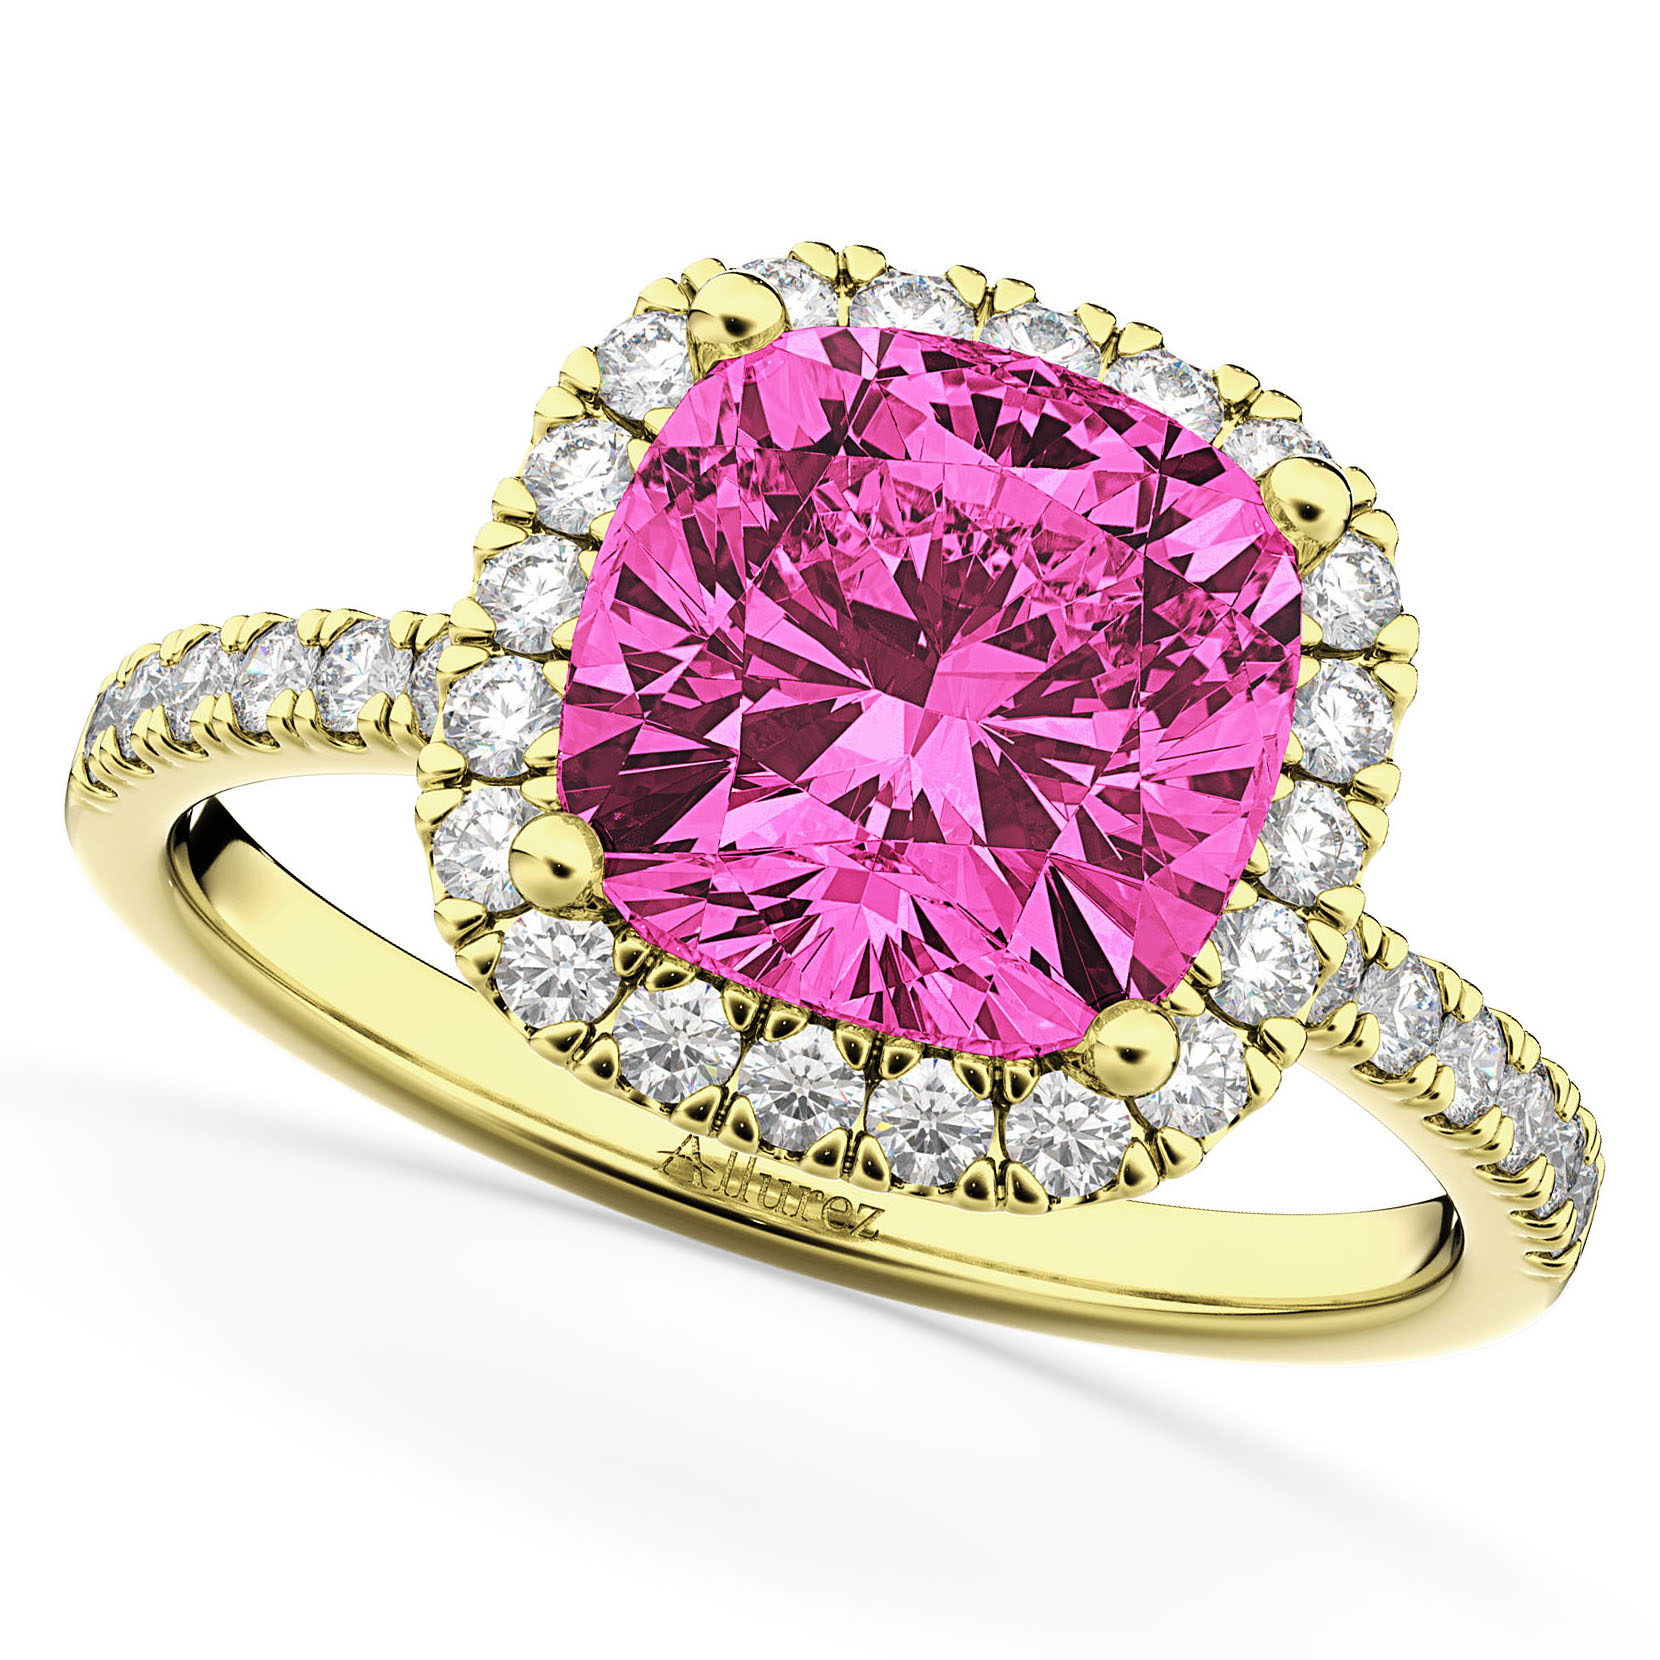 Cushion Cut Halo Pink Tourmaline & Diamond Engagement Ring 14k Yellow Gold (3.11ct)